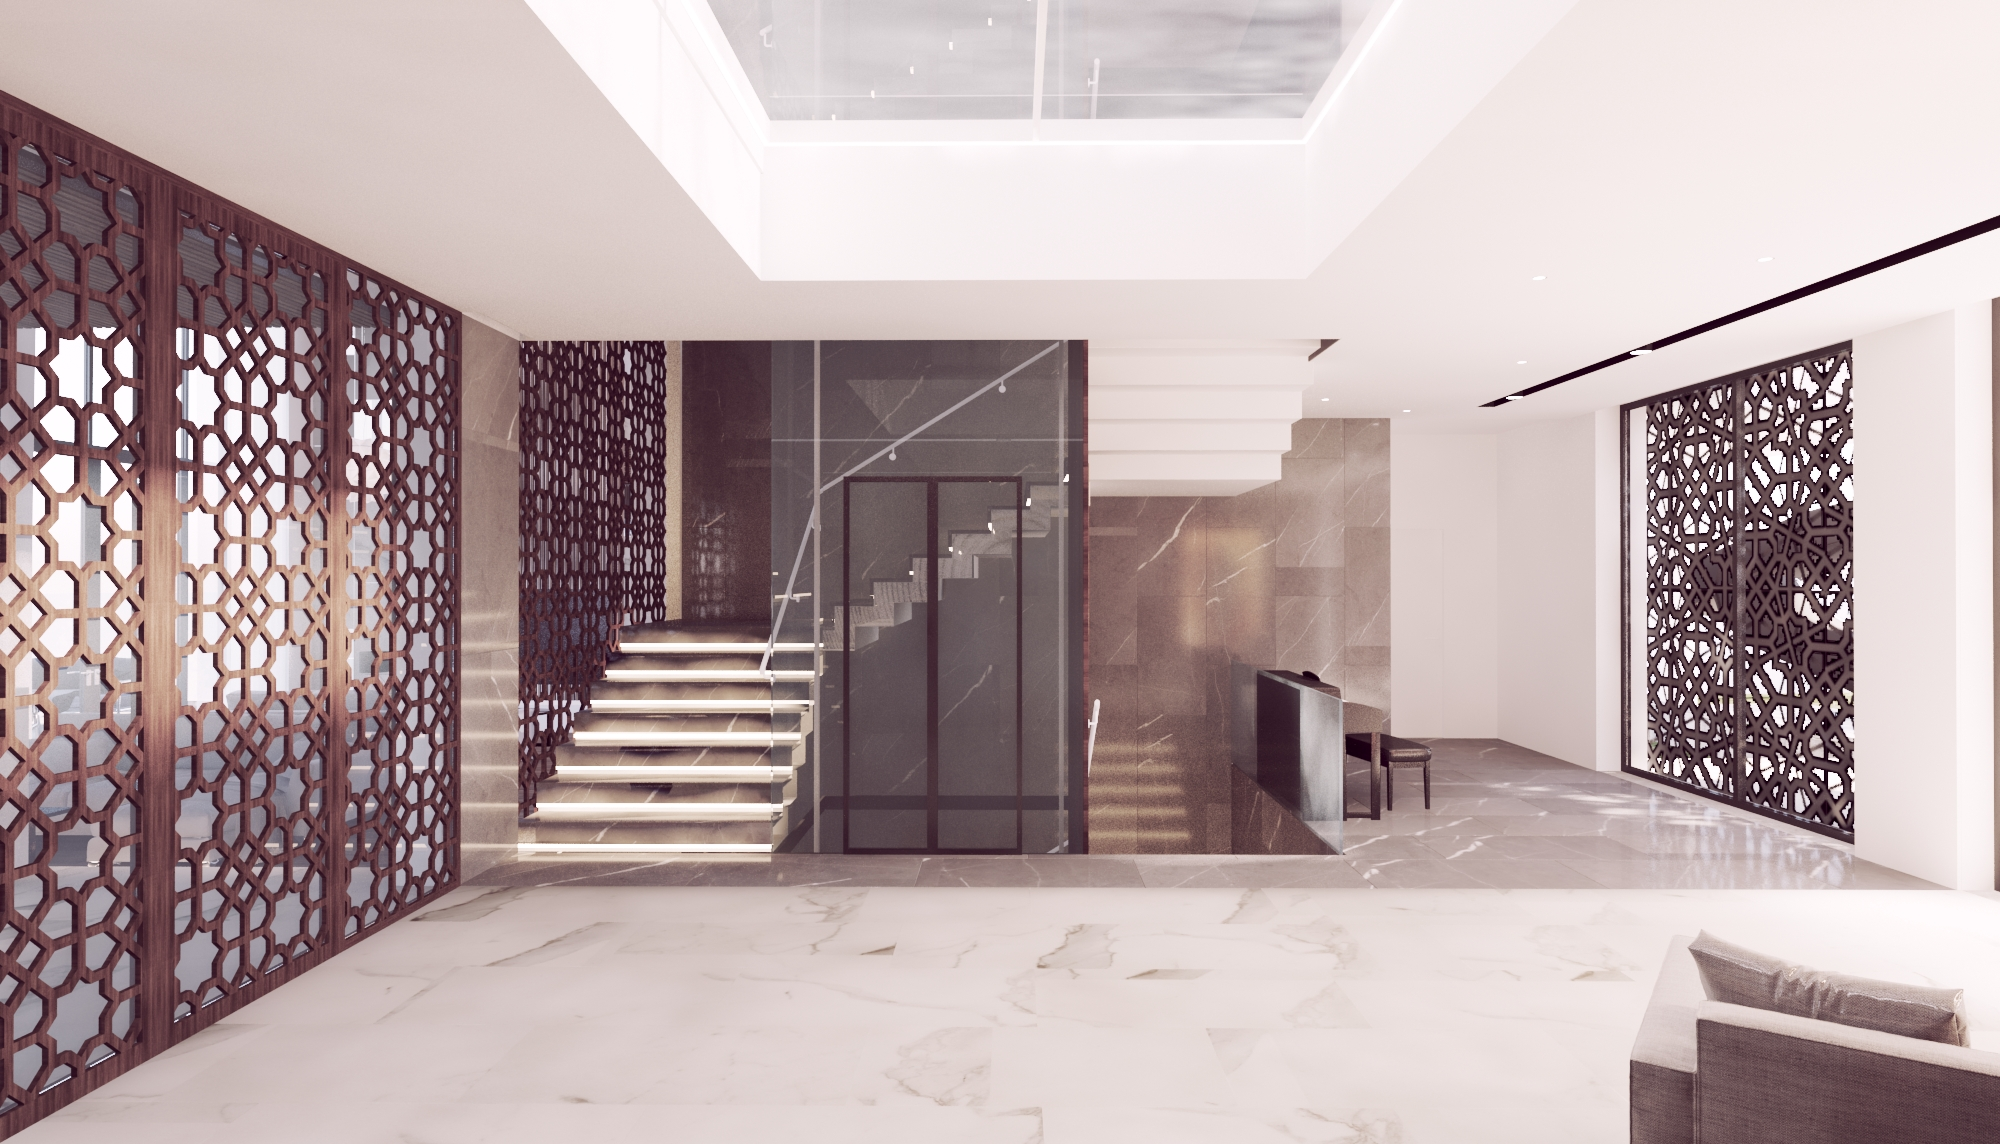 https://nbc-arhitect.ro/wp-content/uploads/2020/10/NBC-Arhitect-_-residences-_-Mogo-Villa-_-Romania-_-interior-view_23.jpg